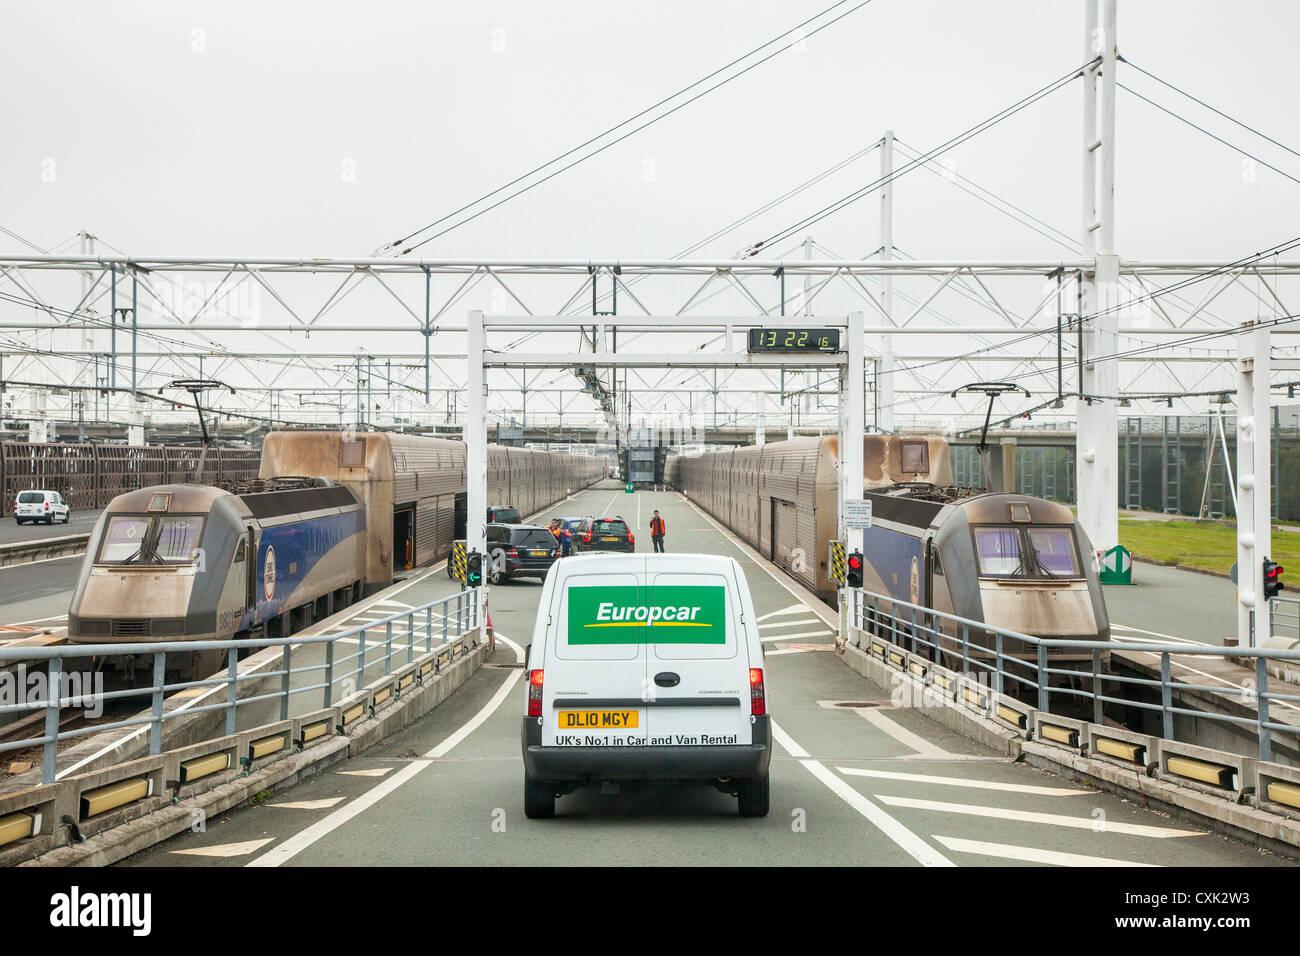 Los vehículos a bordo de un tren en Eurotunnel Folkestone, Inglaterra Imagen De Stock